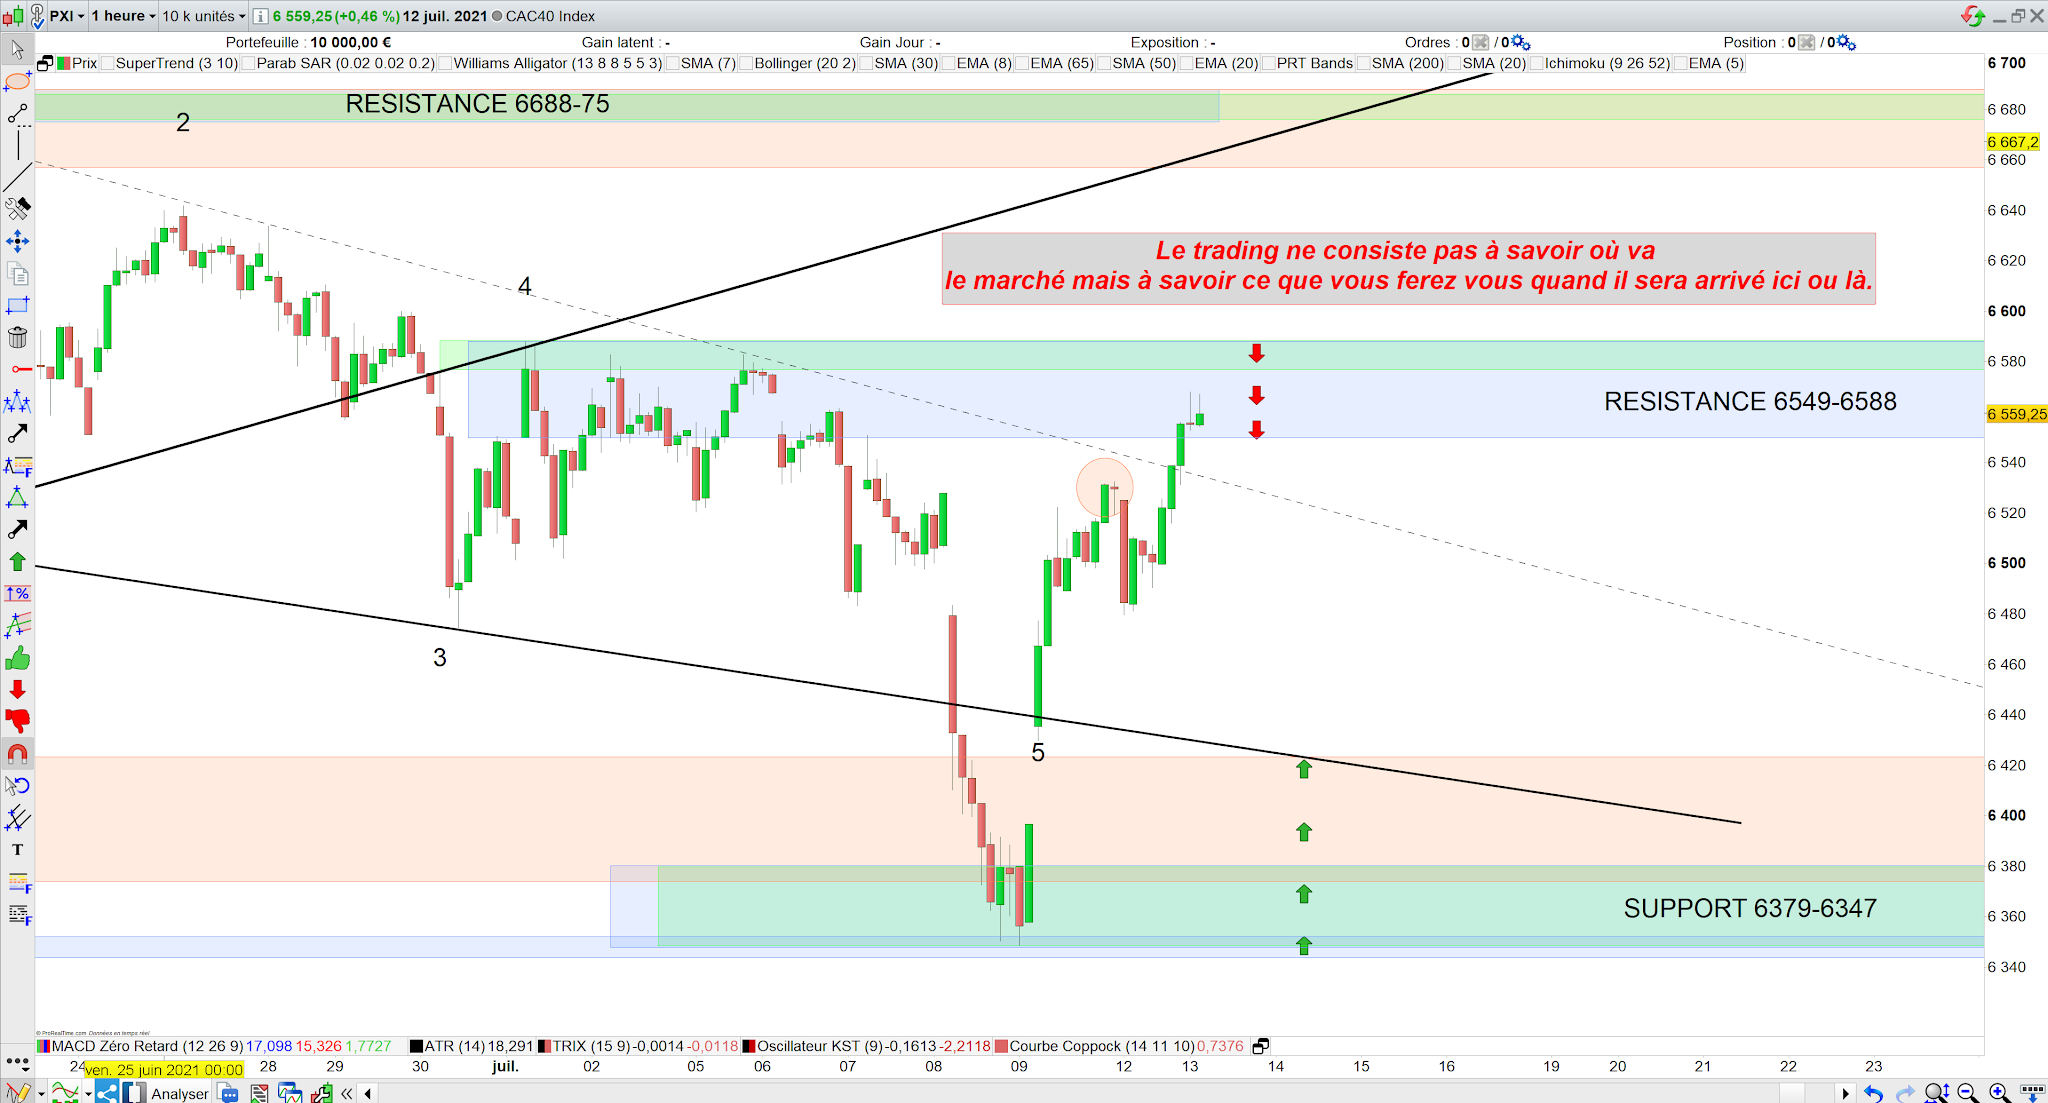 Trading cac40 bilan 12/07/21